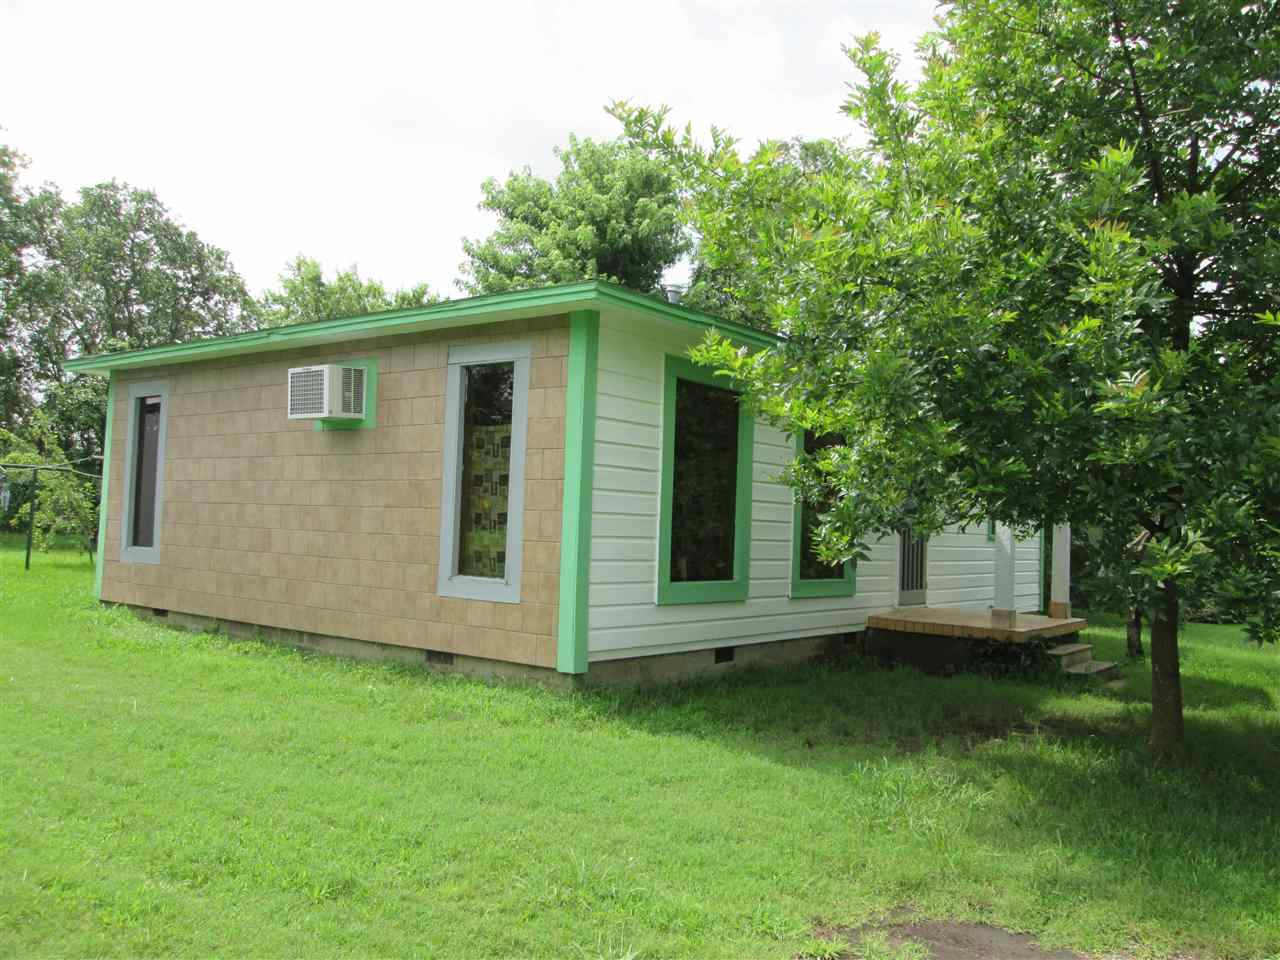 Real Estate for Sale, ListingId: 34293140, Caddo,OK74729